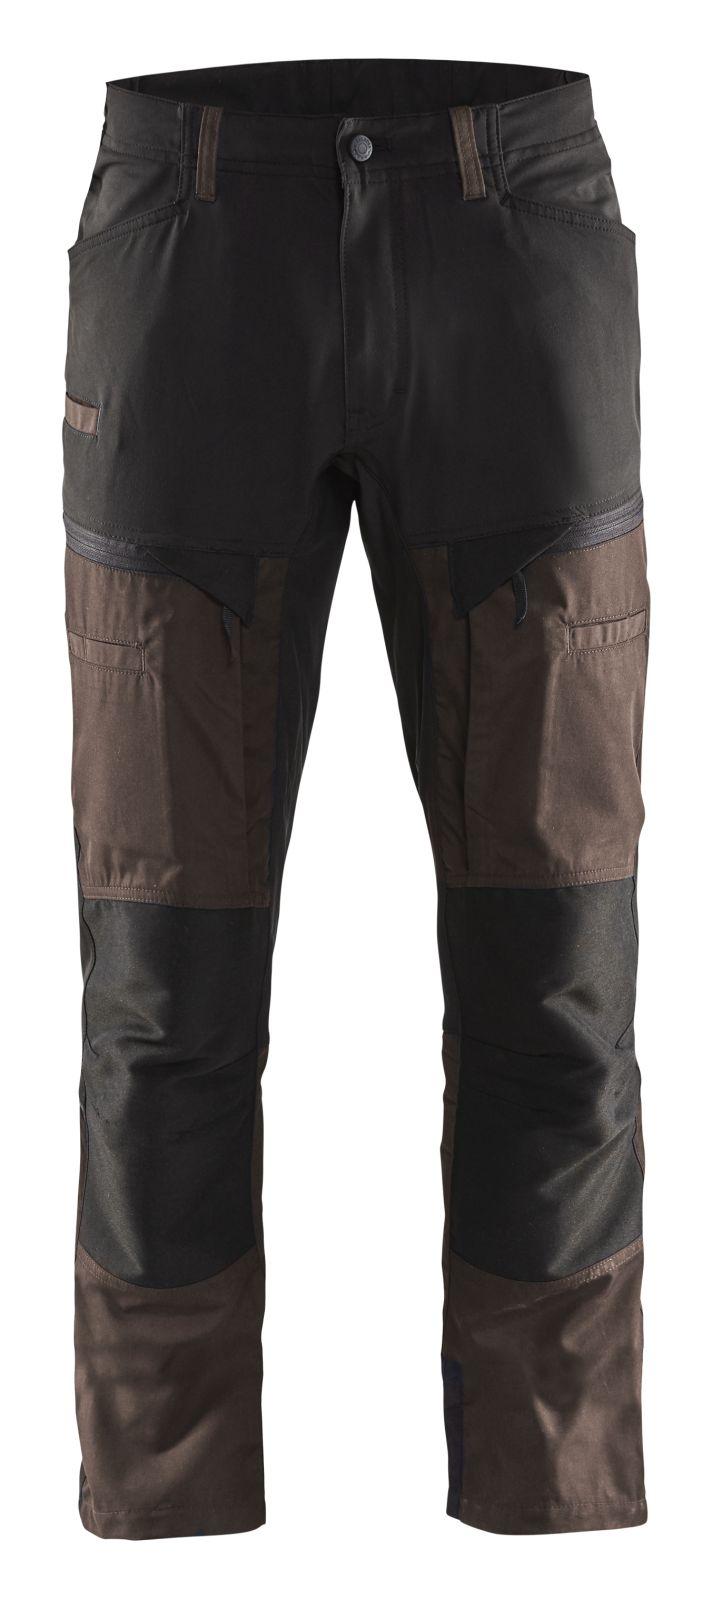 Blaklader Werkbroeken 14561845 met Stretch bruin-zwart(7899)